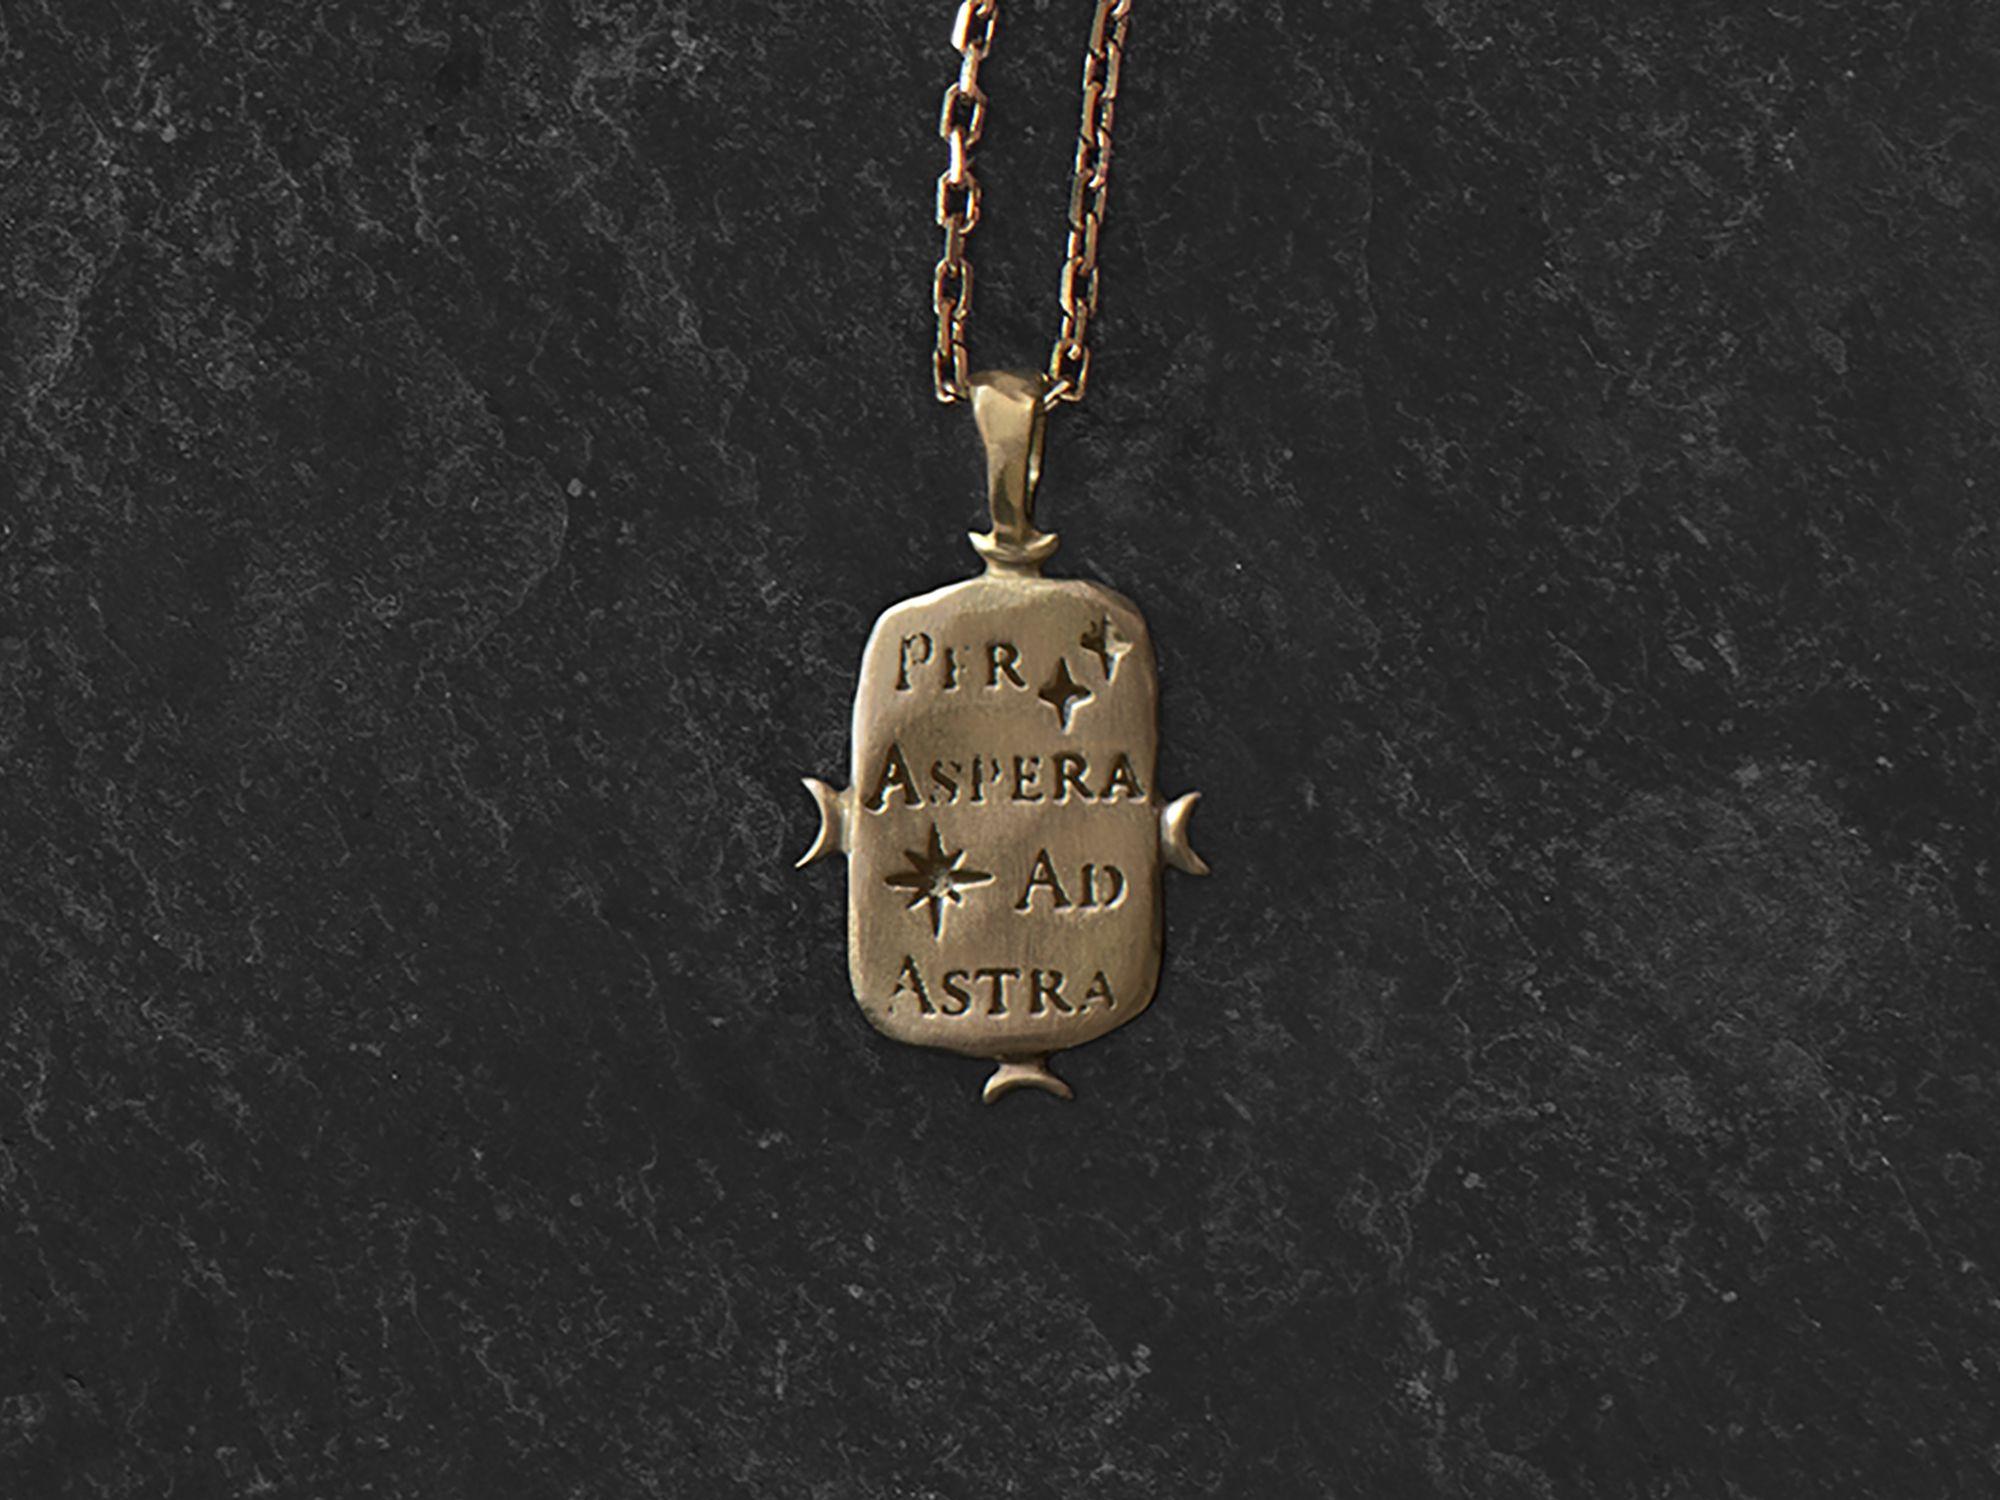 Ad Astra vermeil necklace by Emmanuelle Zysman